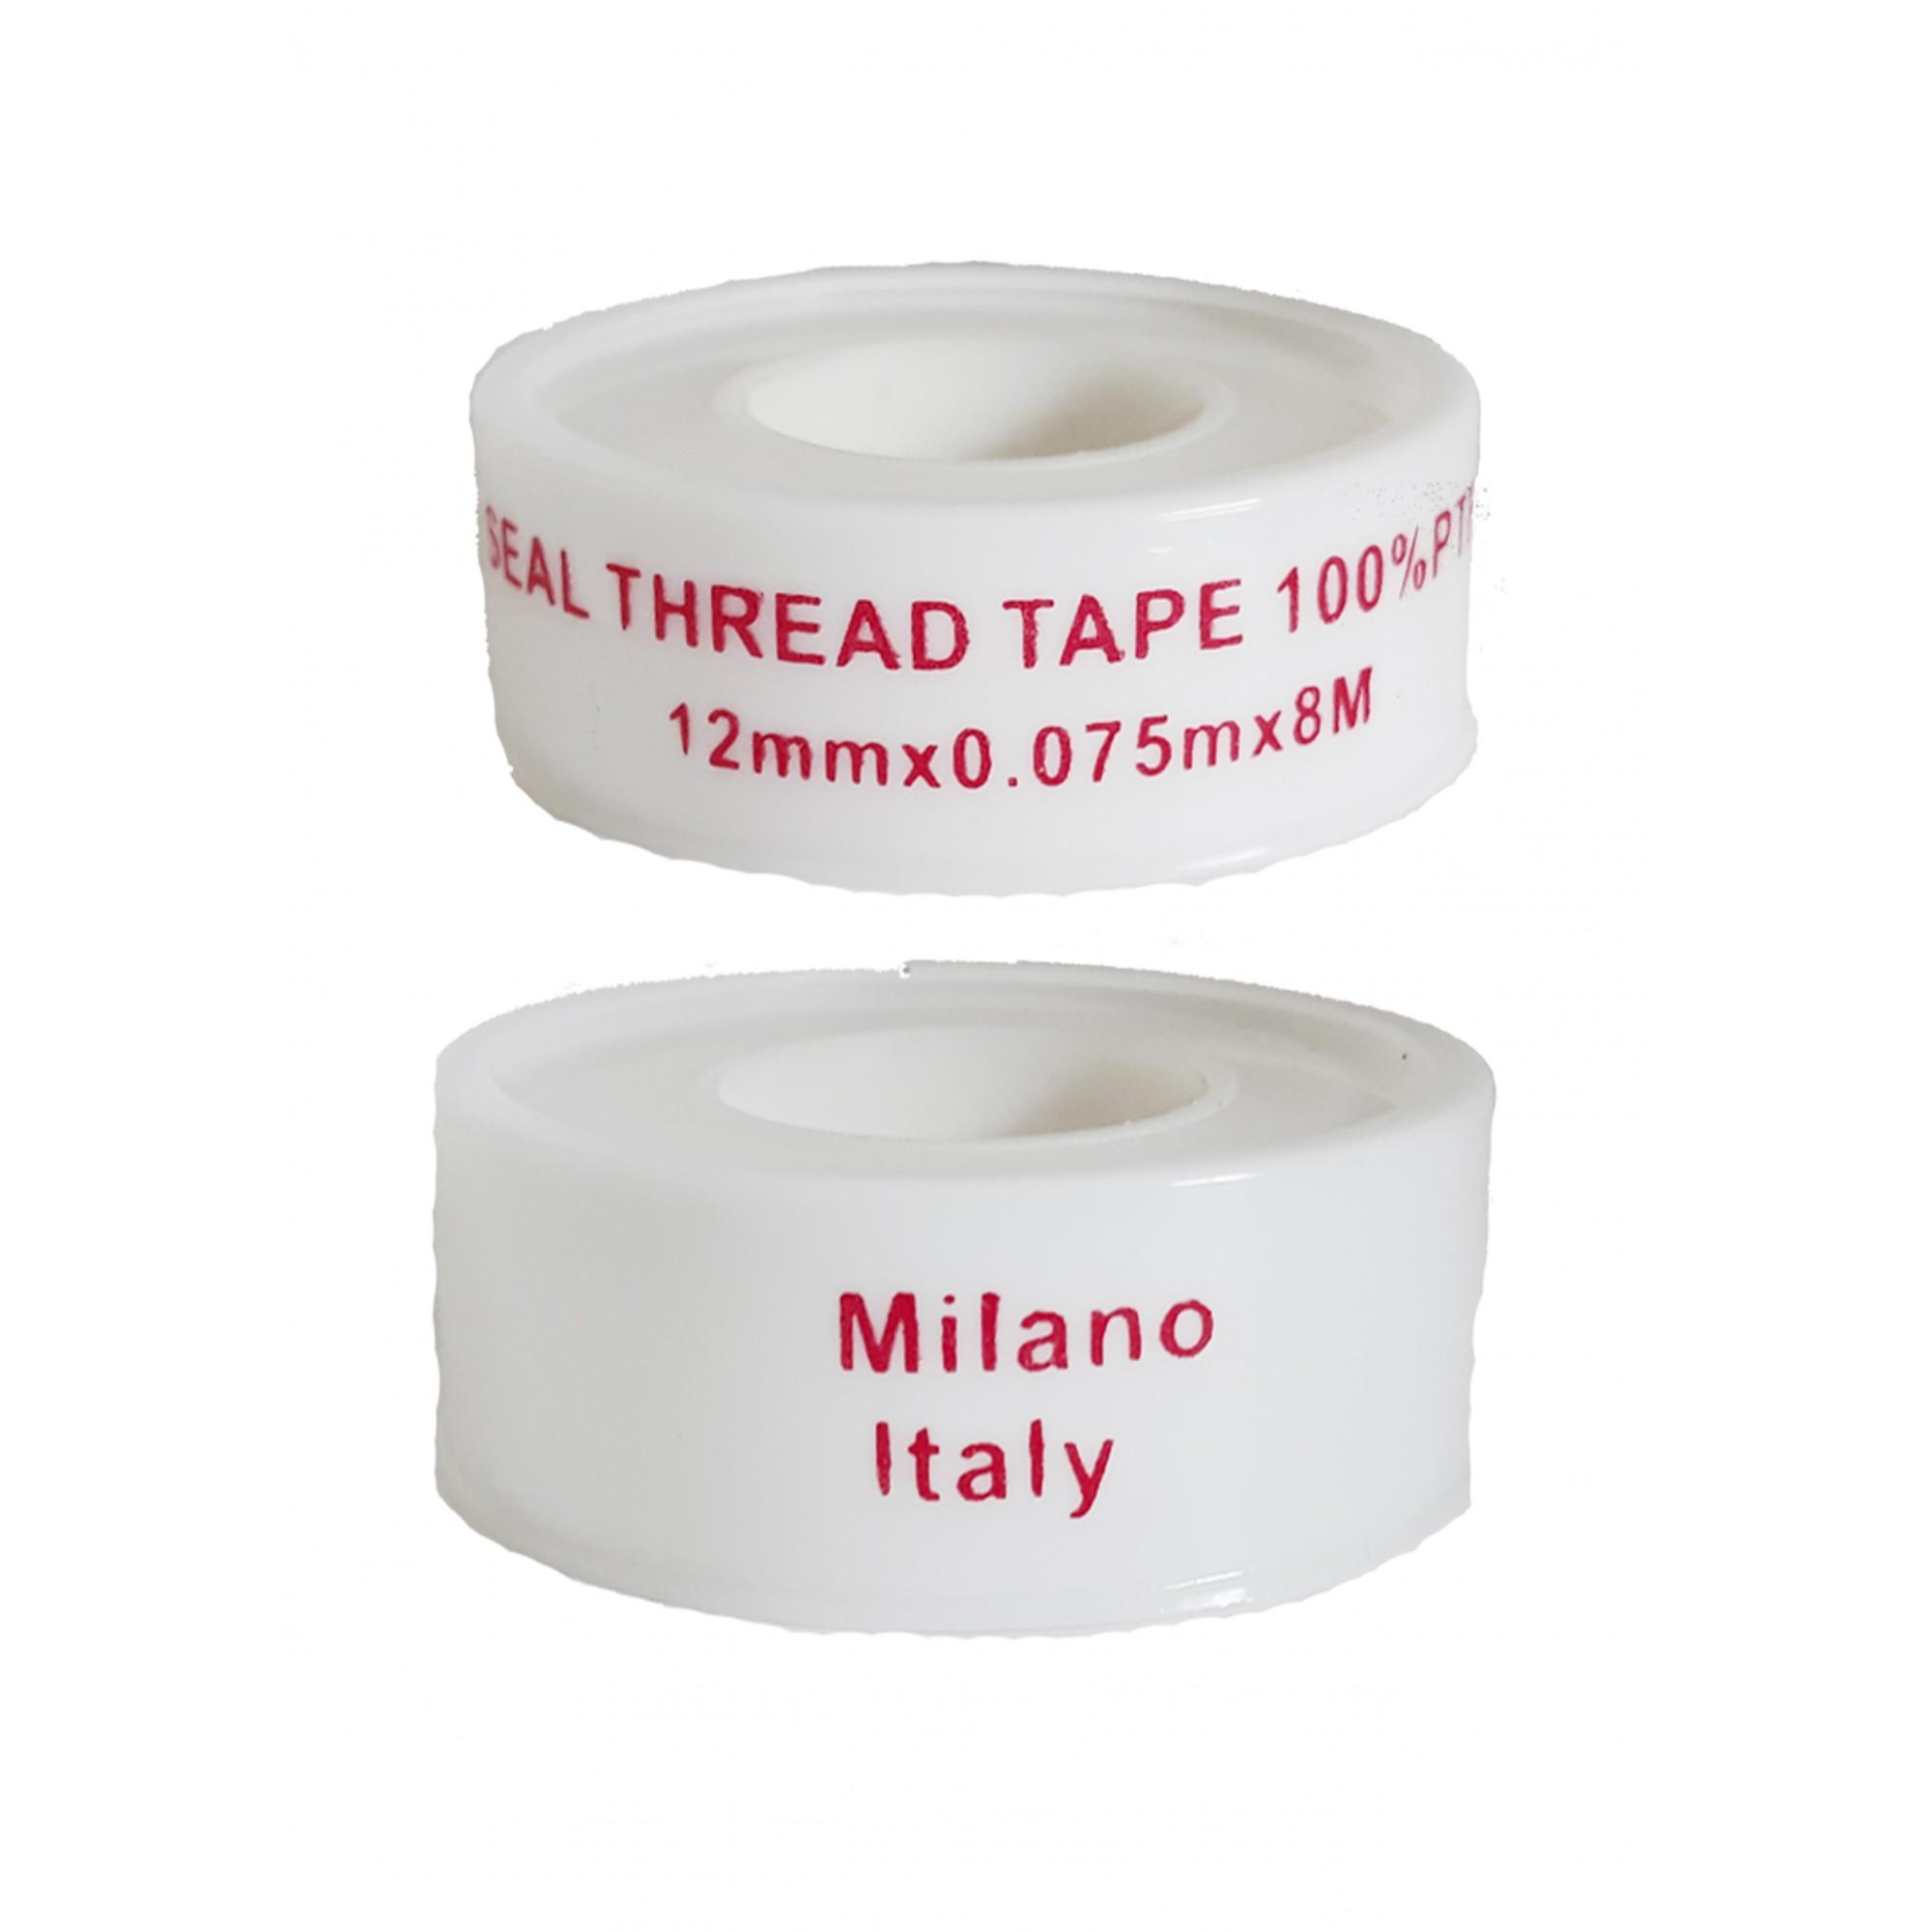 Упаковка фум ленты 10 шт белая Milano 12*0.075*8м  - 1